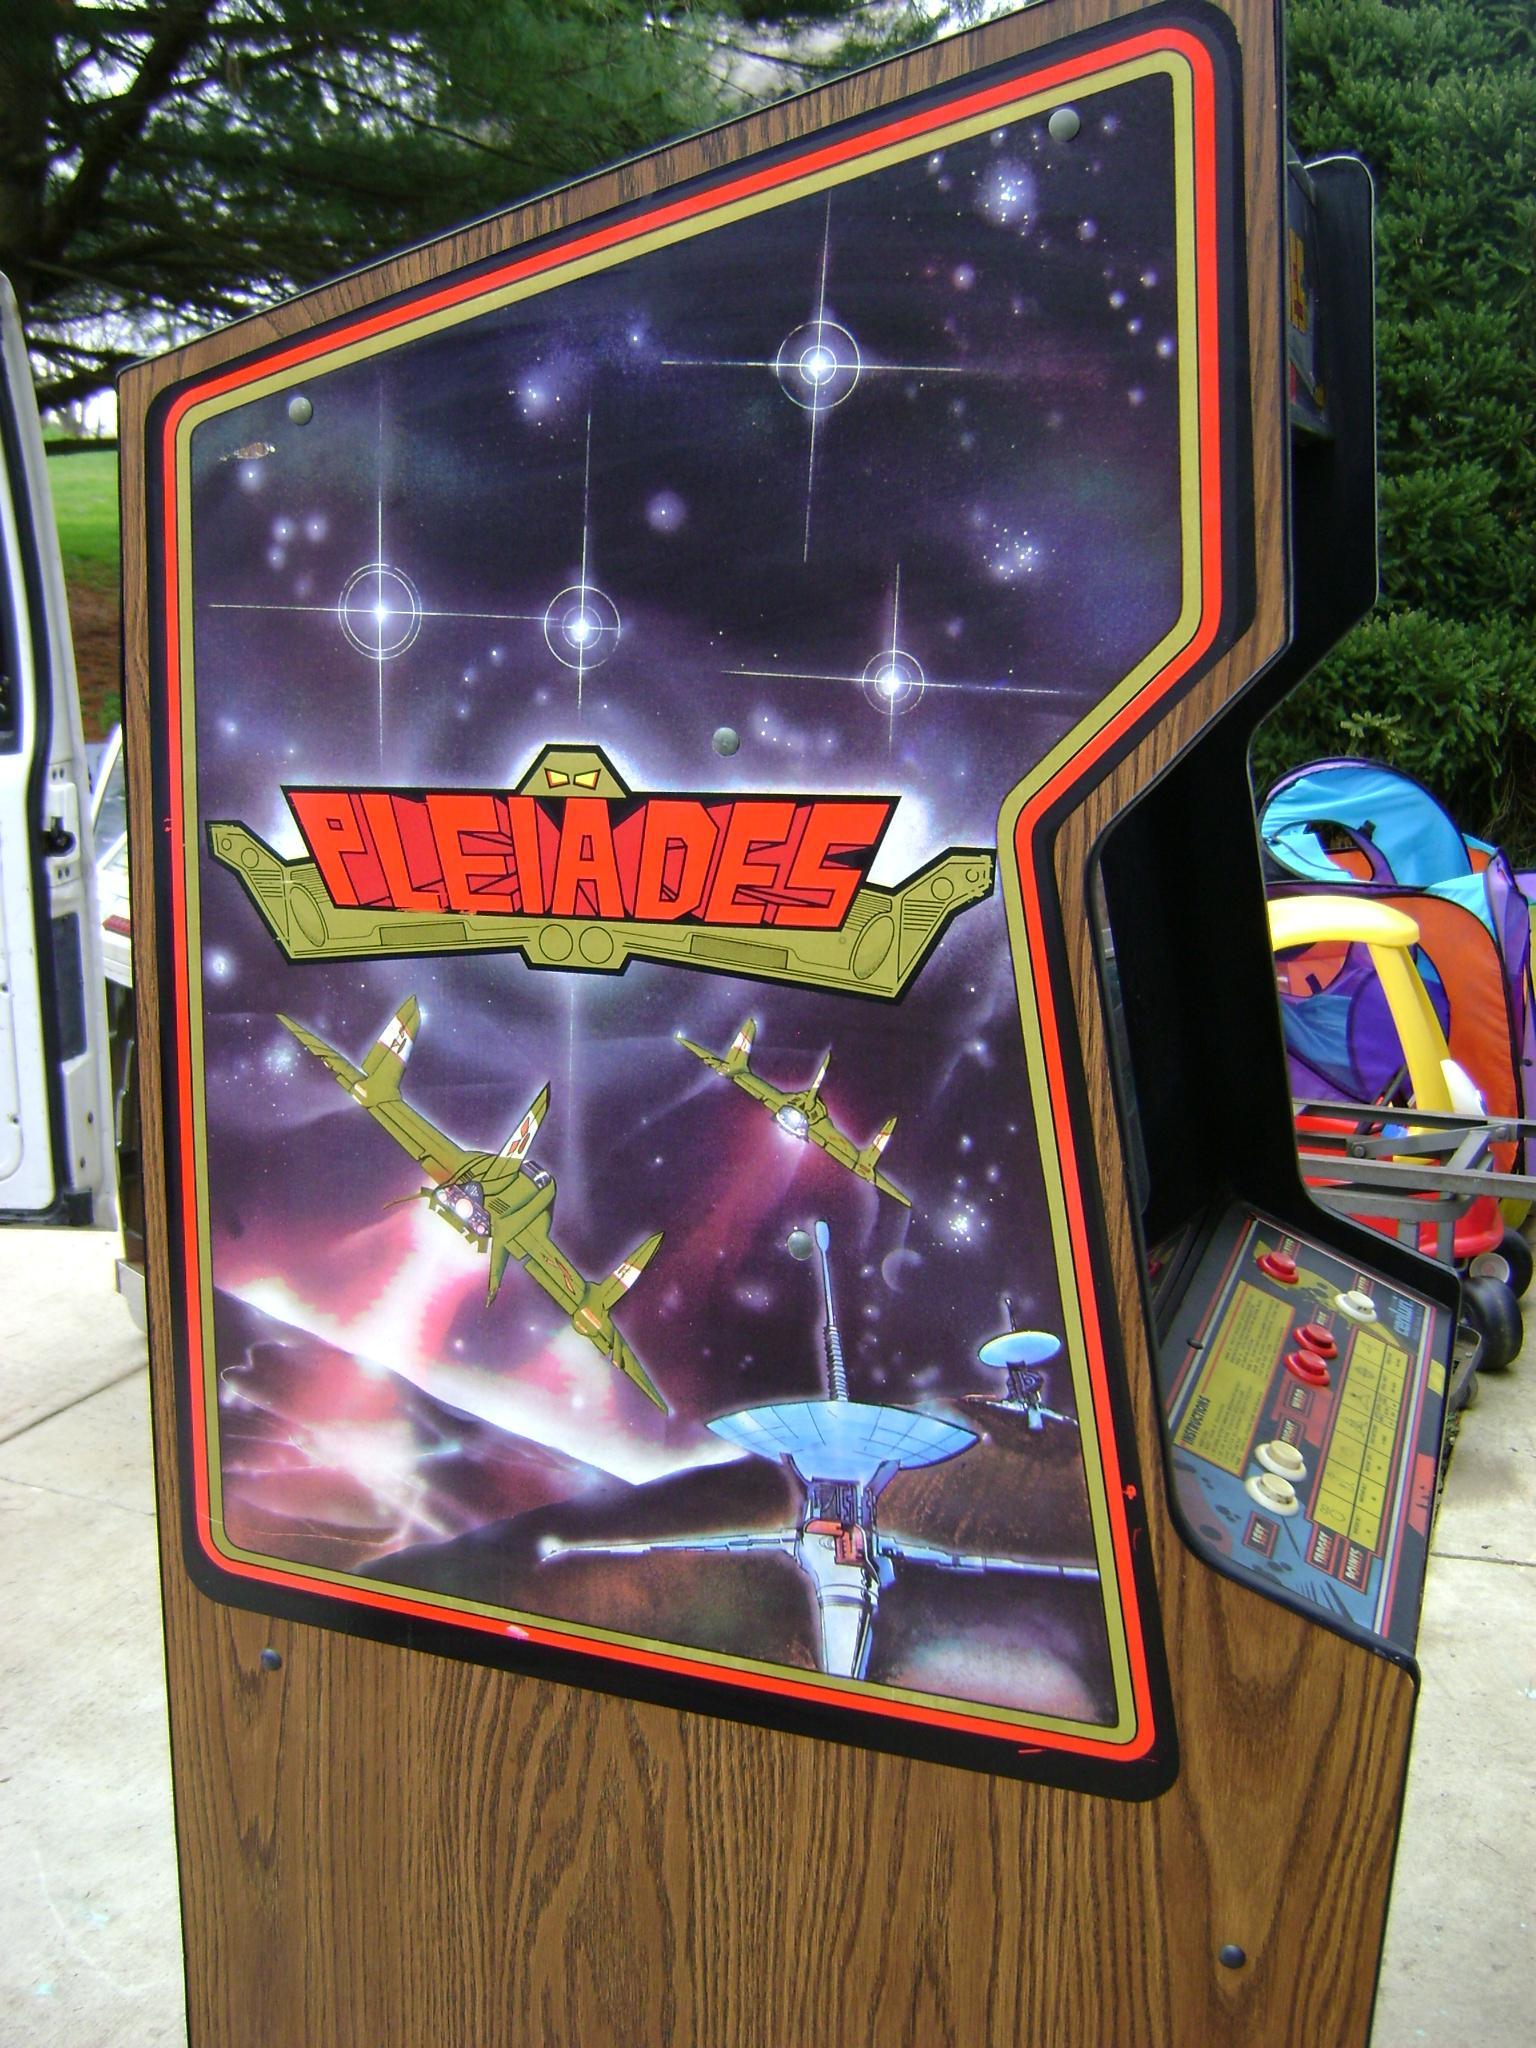 Pleiades Arcade Machine